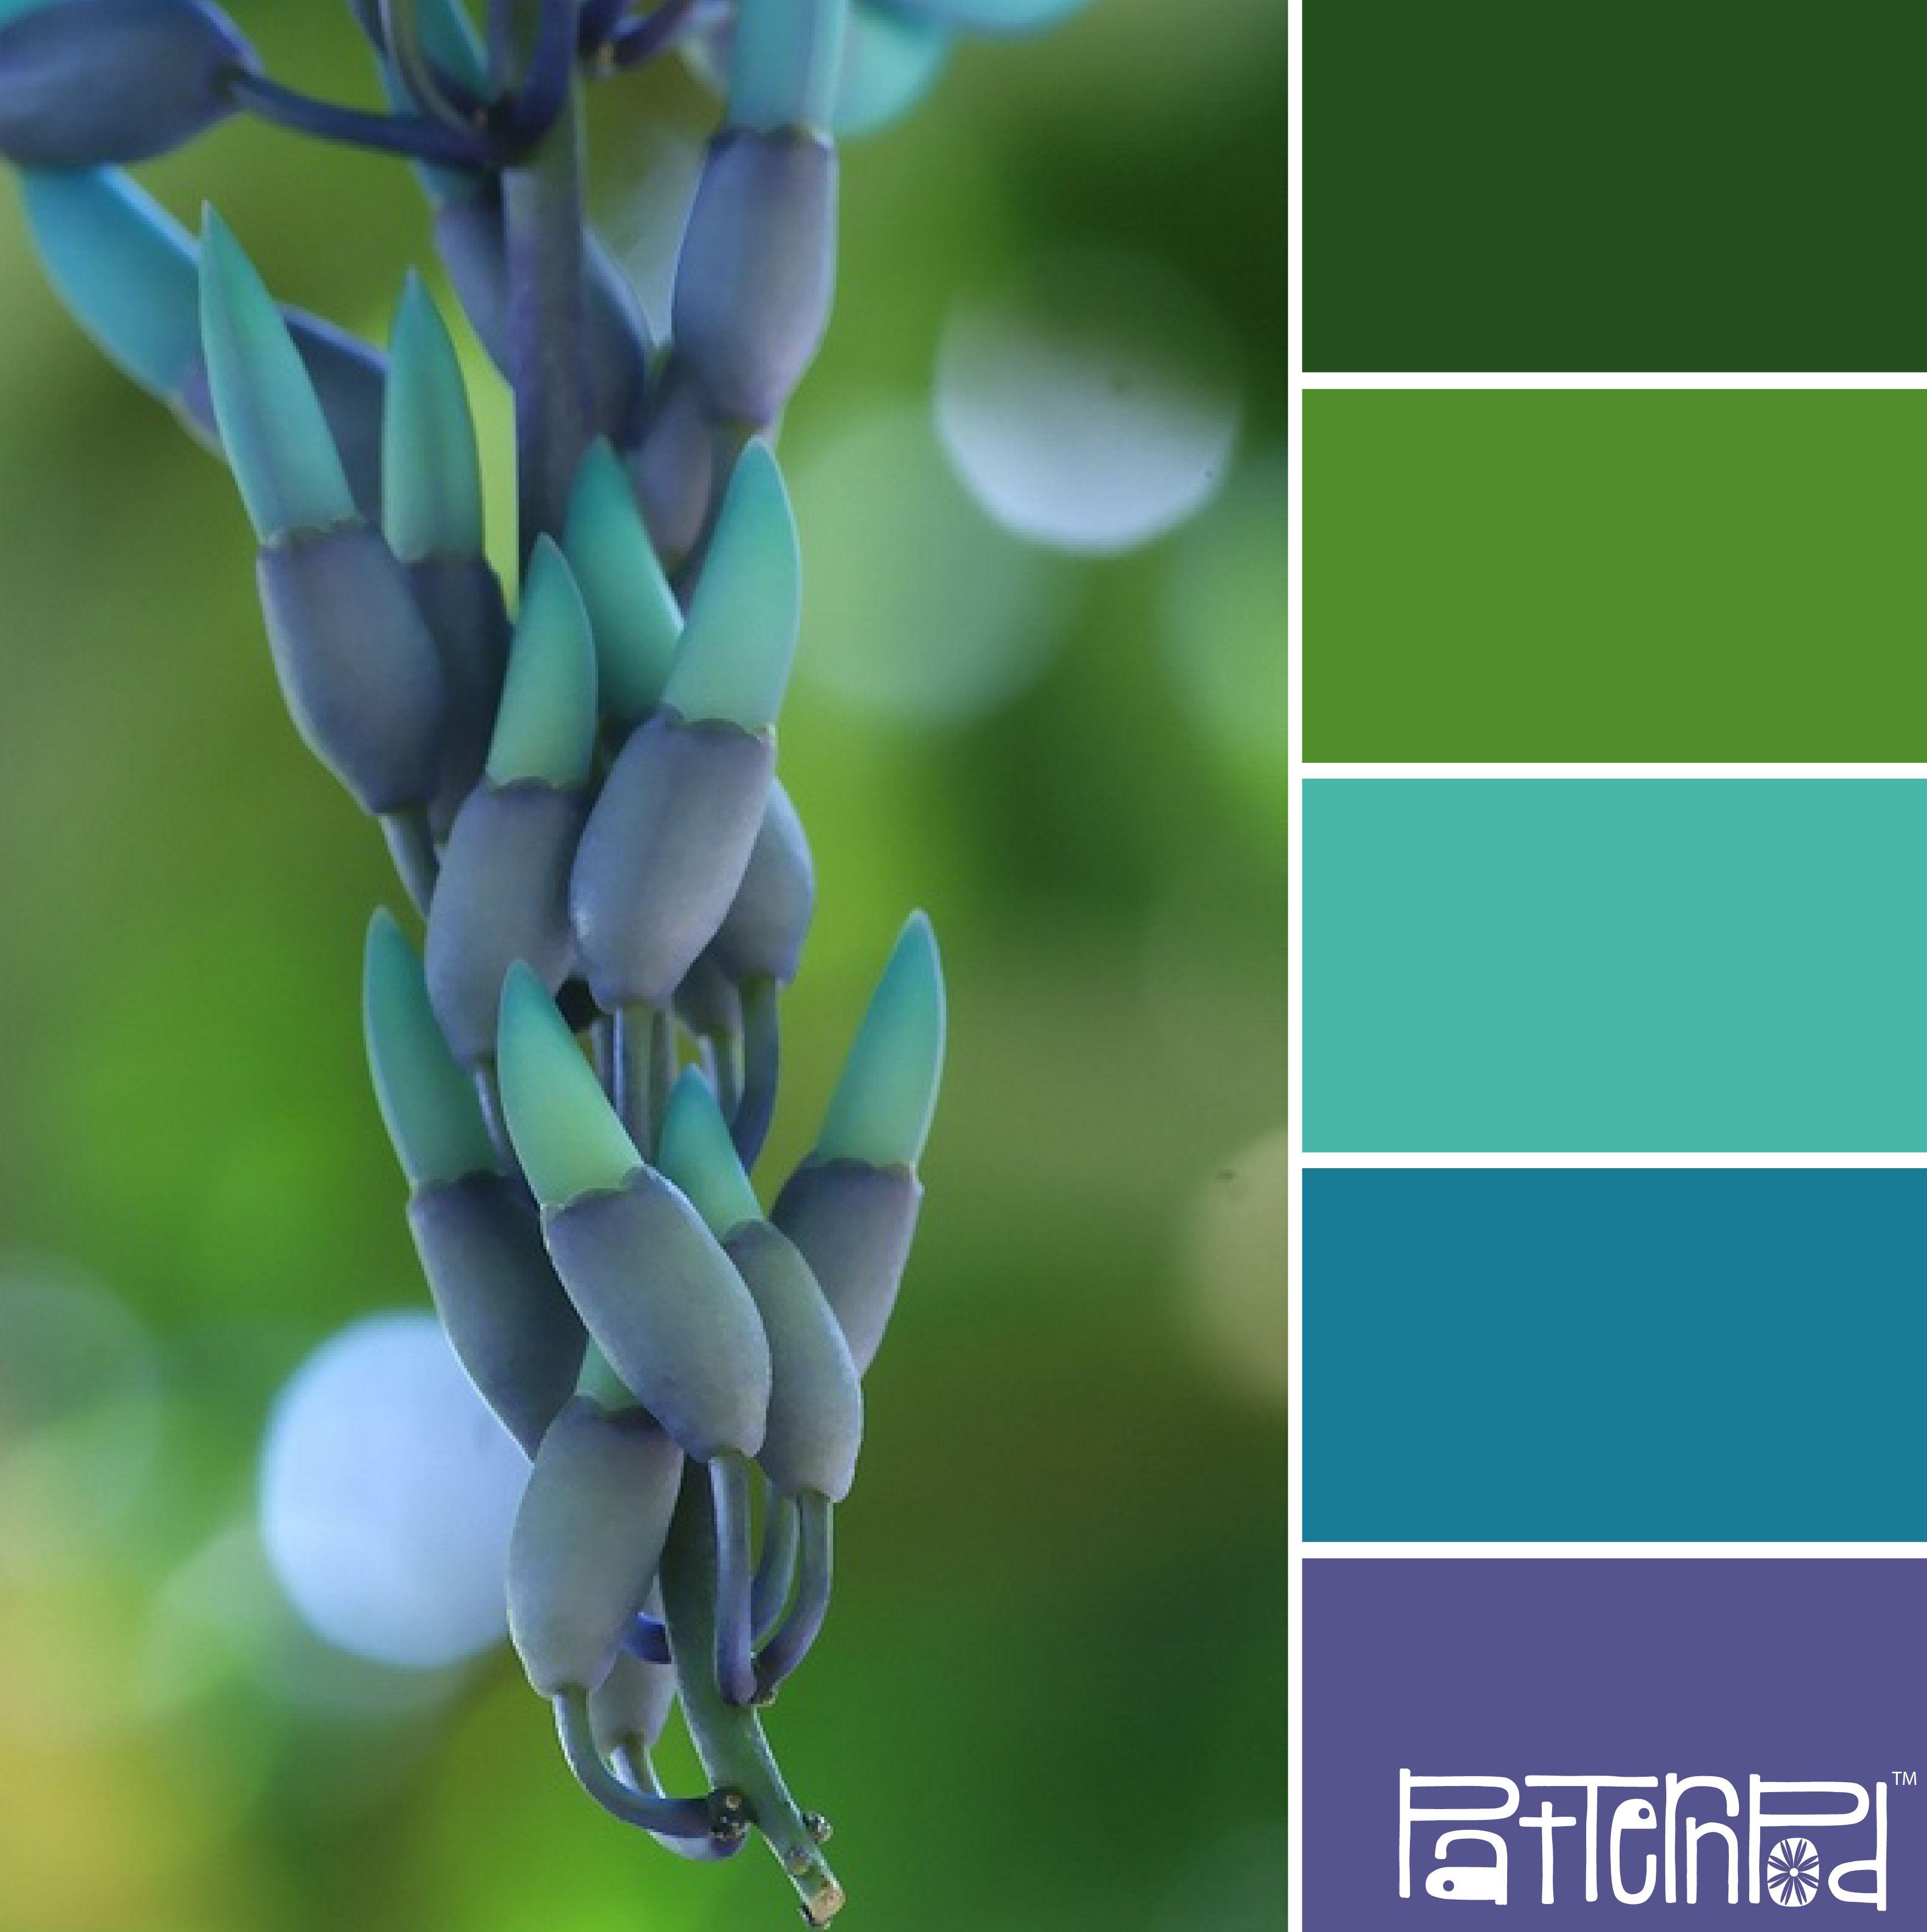 Pin by ella en marjan schippers on color scenes pinterest - Blue and green combination ...